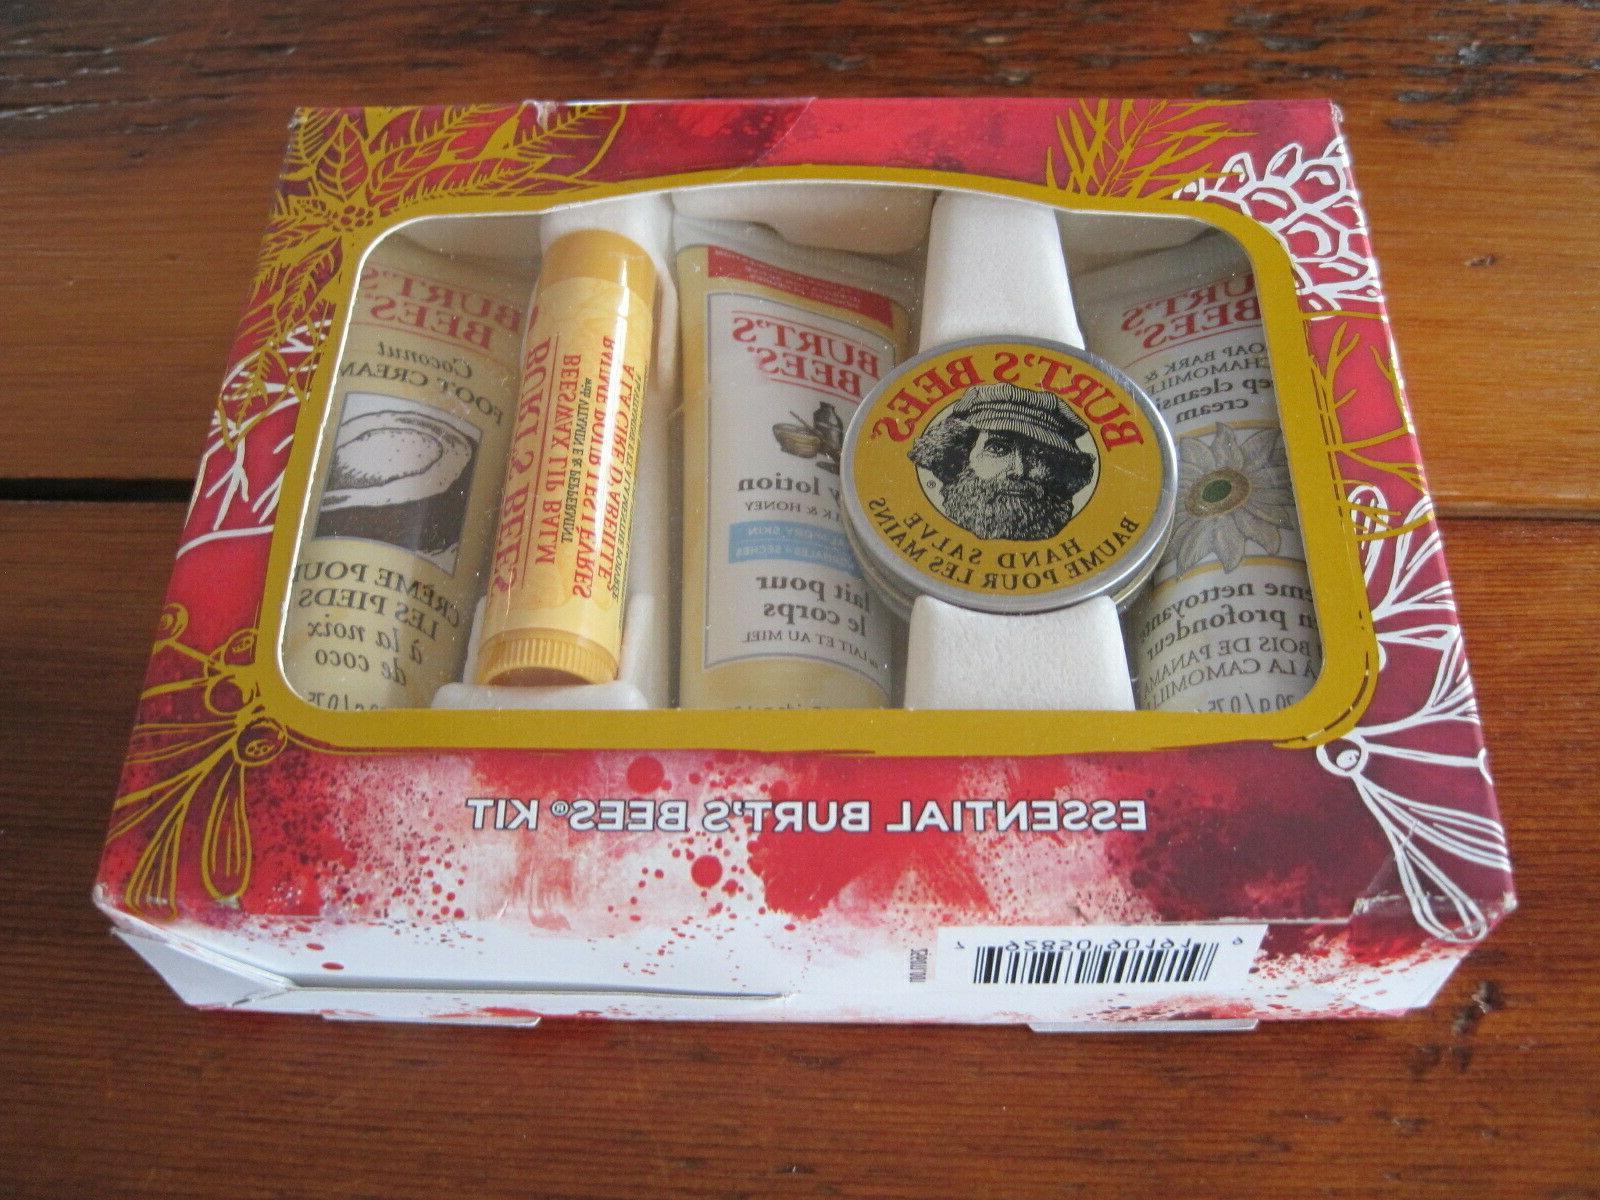 Burt's Holiday Set Essentials Lip Balm Lotion Travel Size 5